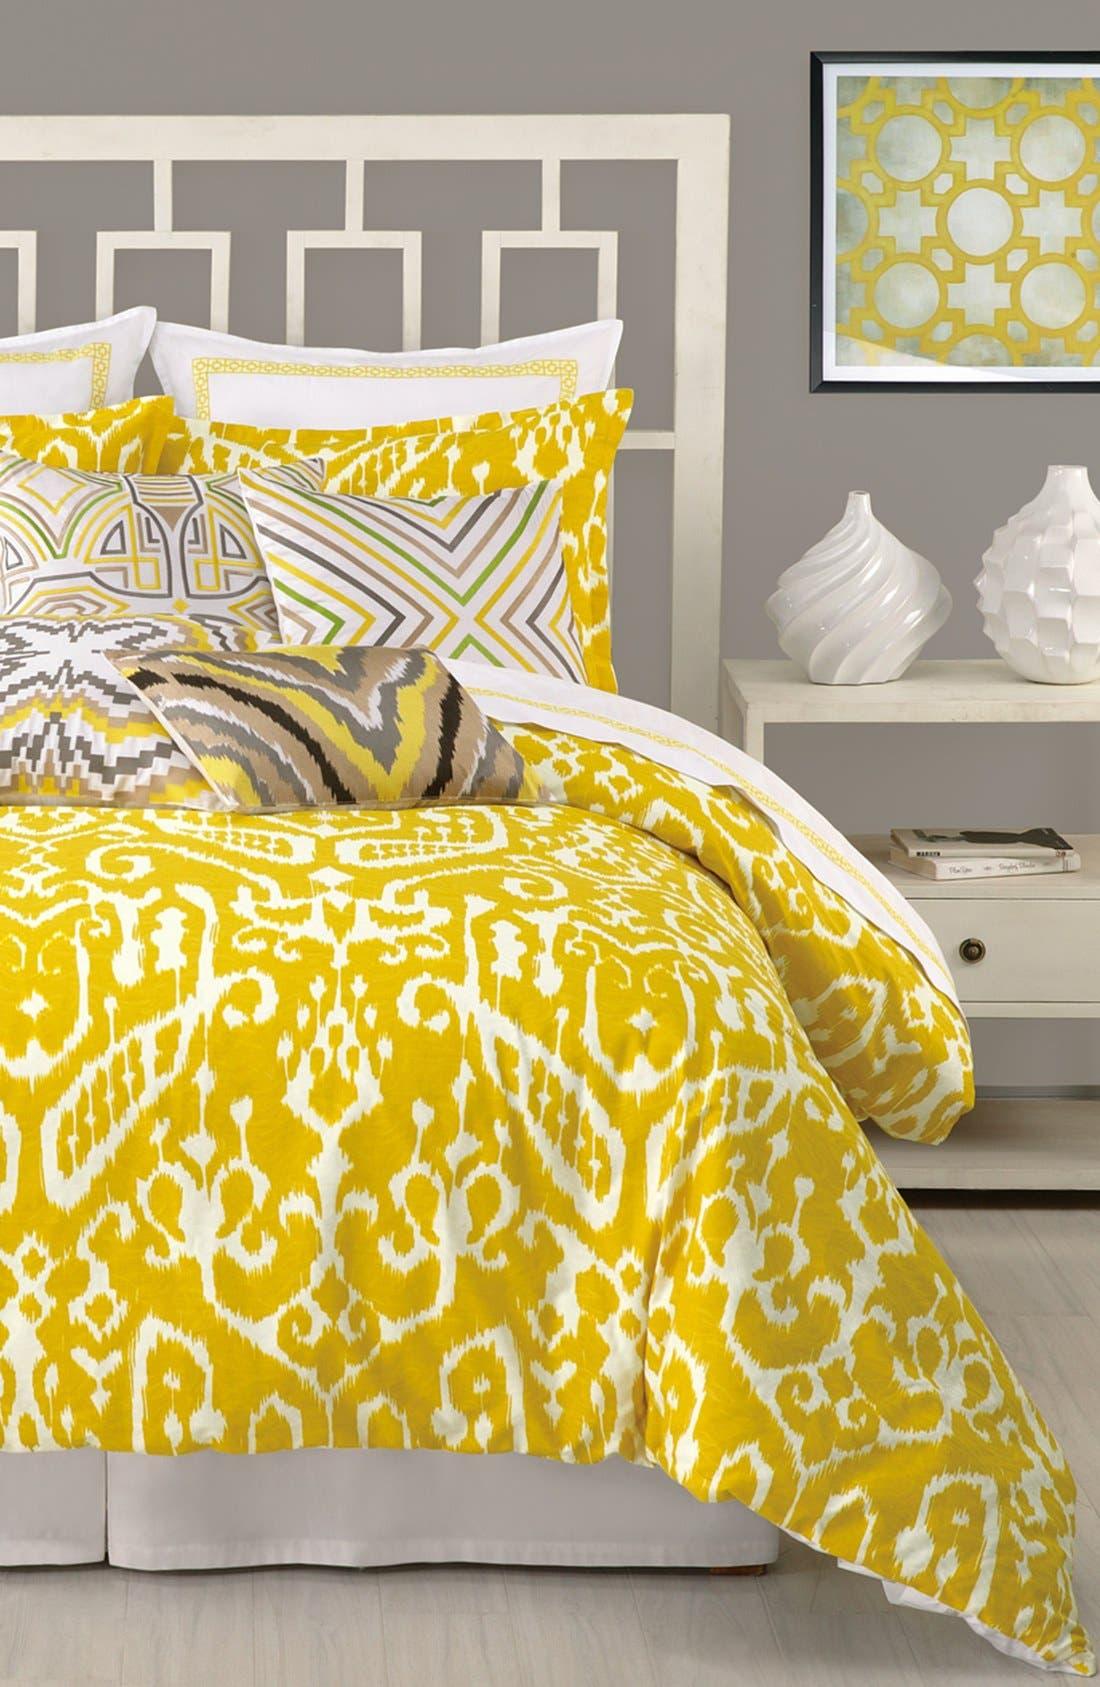 Alternate Image 1 Selected - Trina Turk 'Ikat' Comforter & Shams